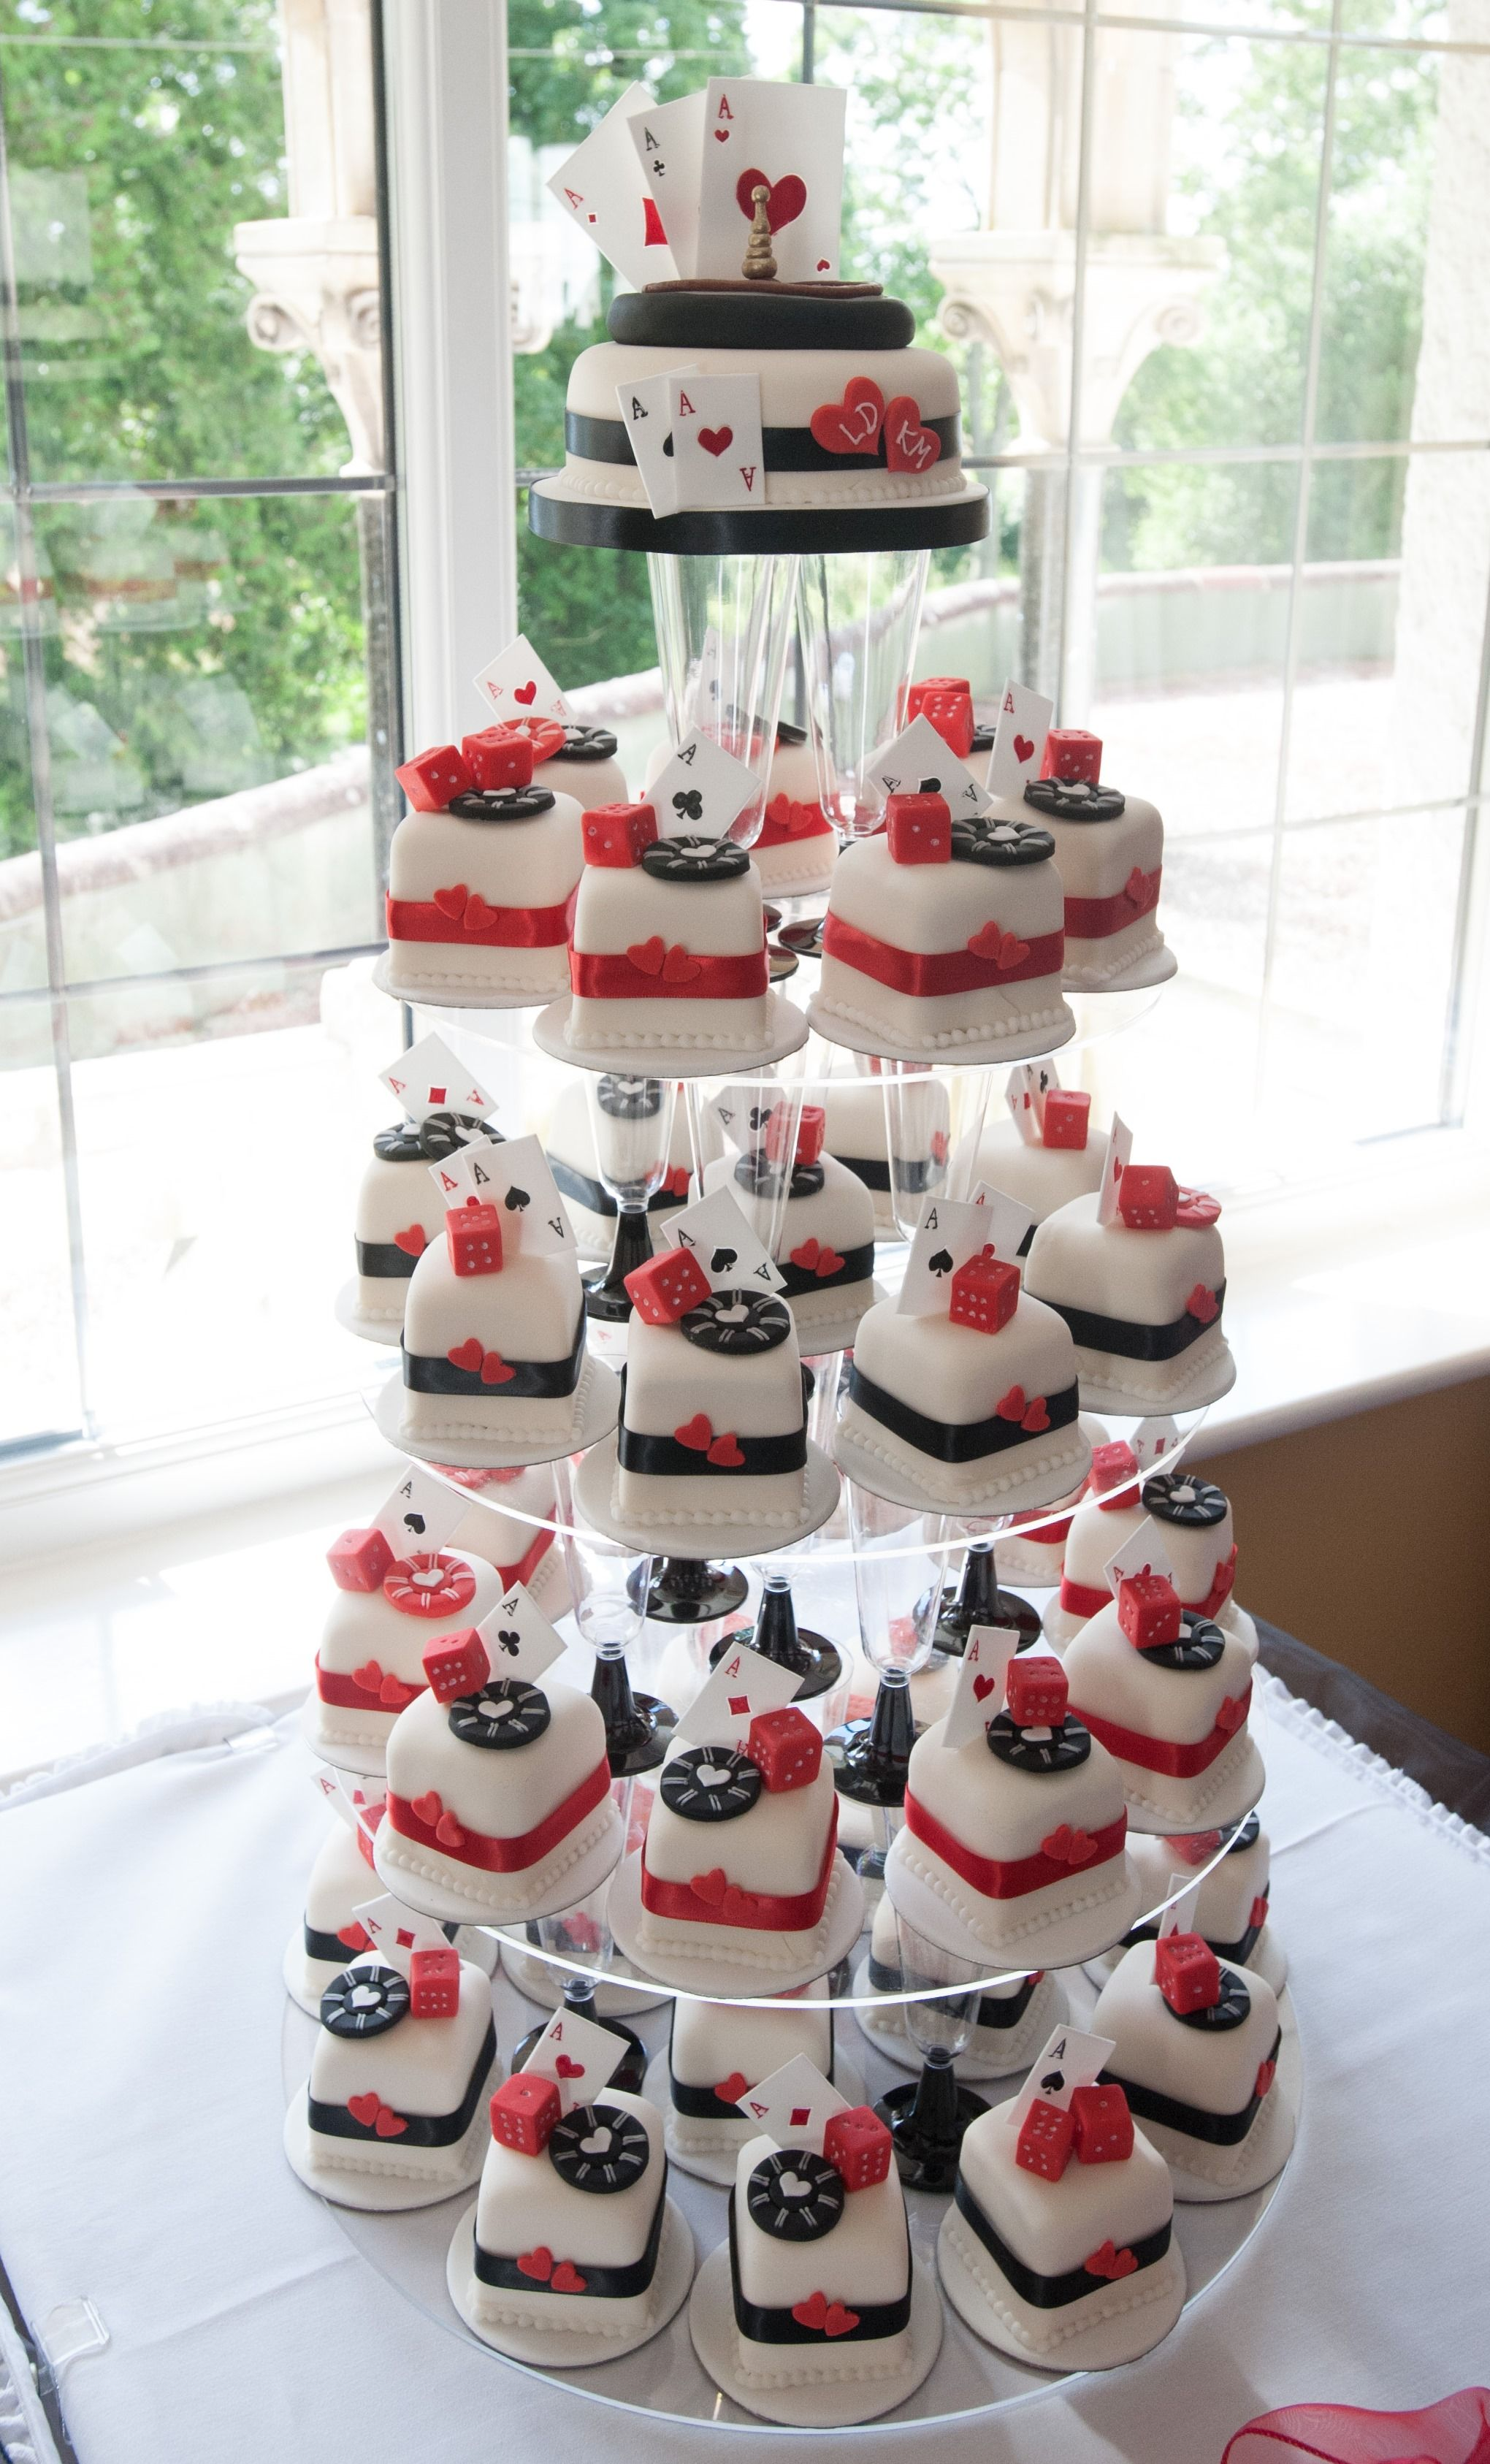 These Las Vegas mini wedding cake or cupcakes are super